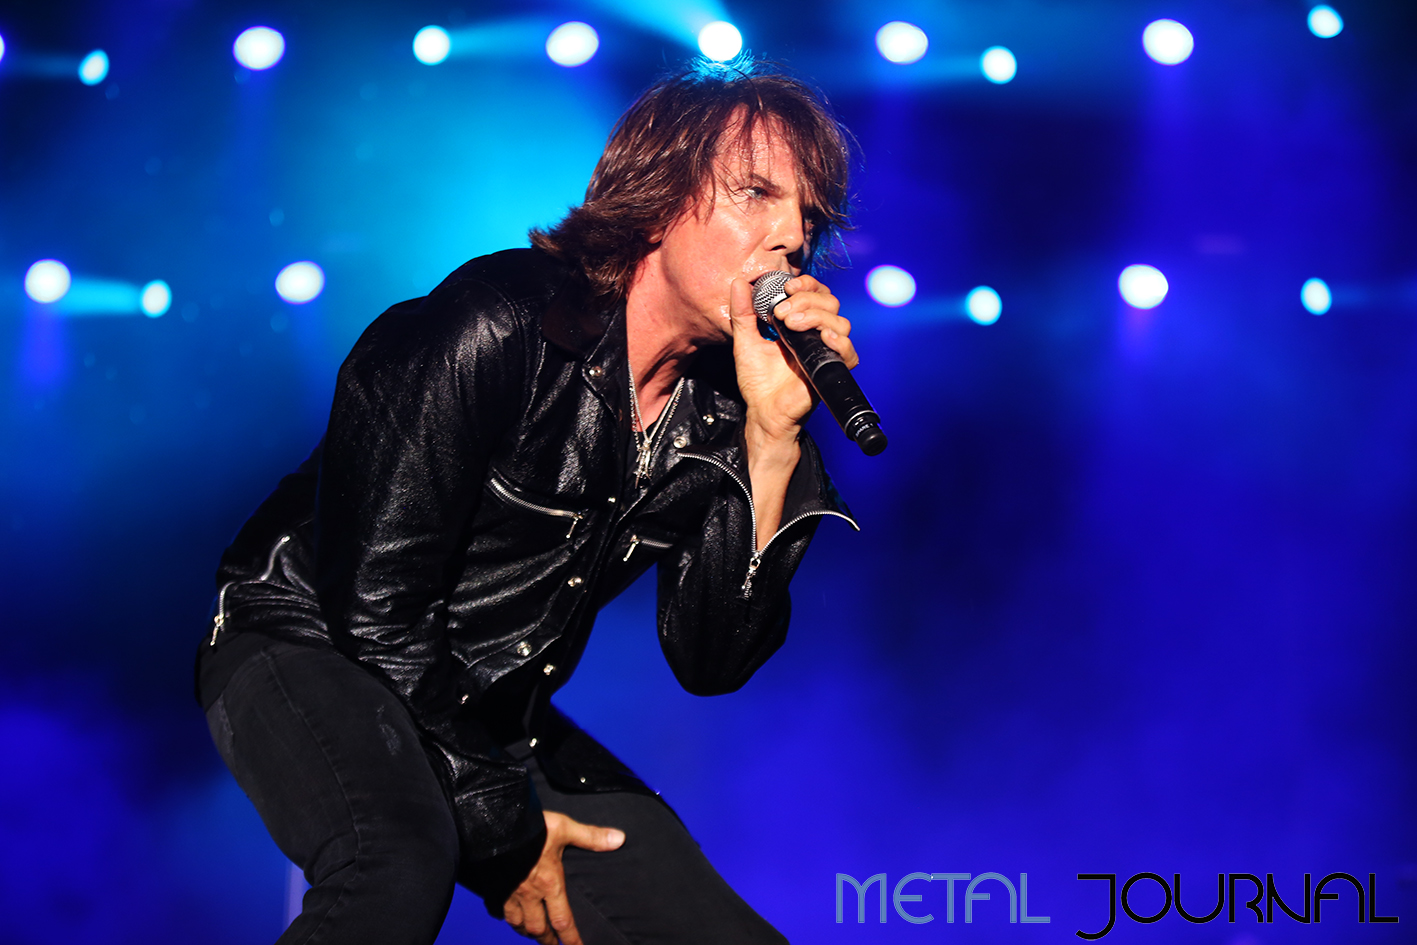 europe - metal journal rock fest barcelona 2019 pic 5